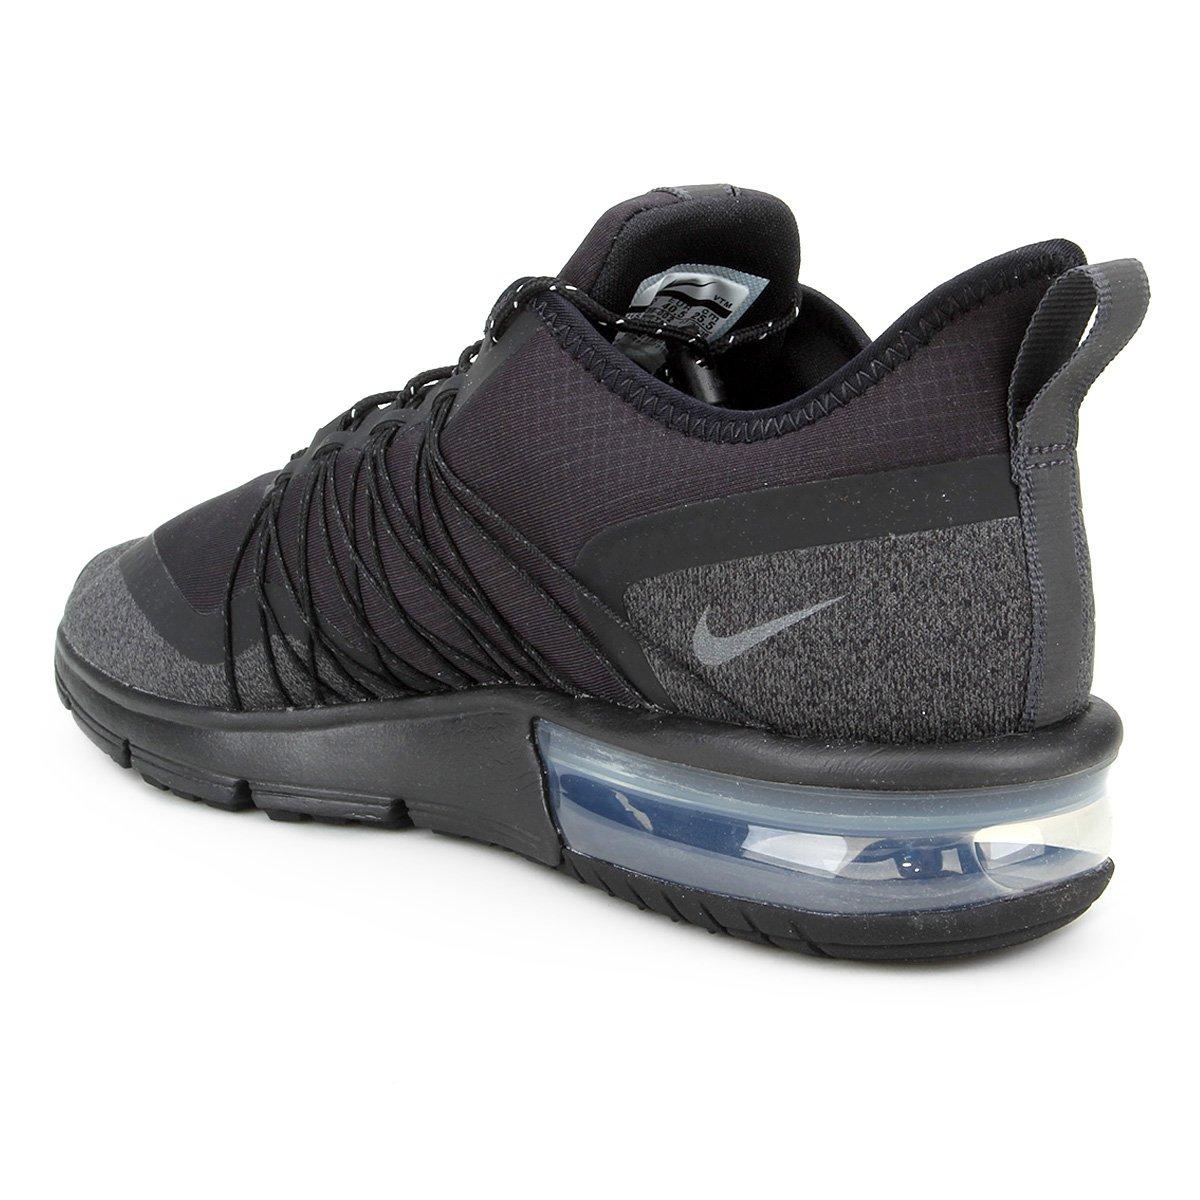 Tênis Nike Air Max Sequent 4 Utility Masculino - 1